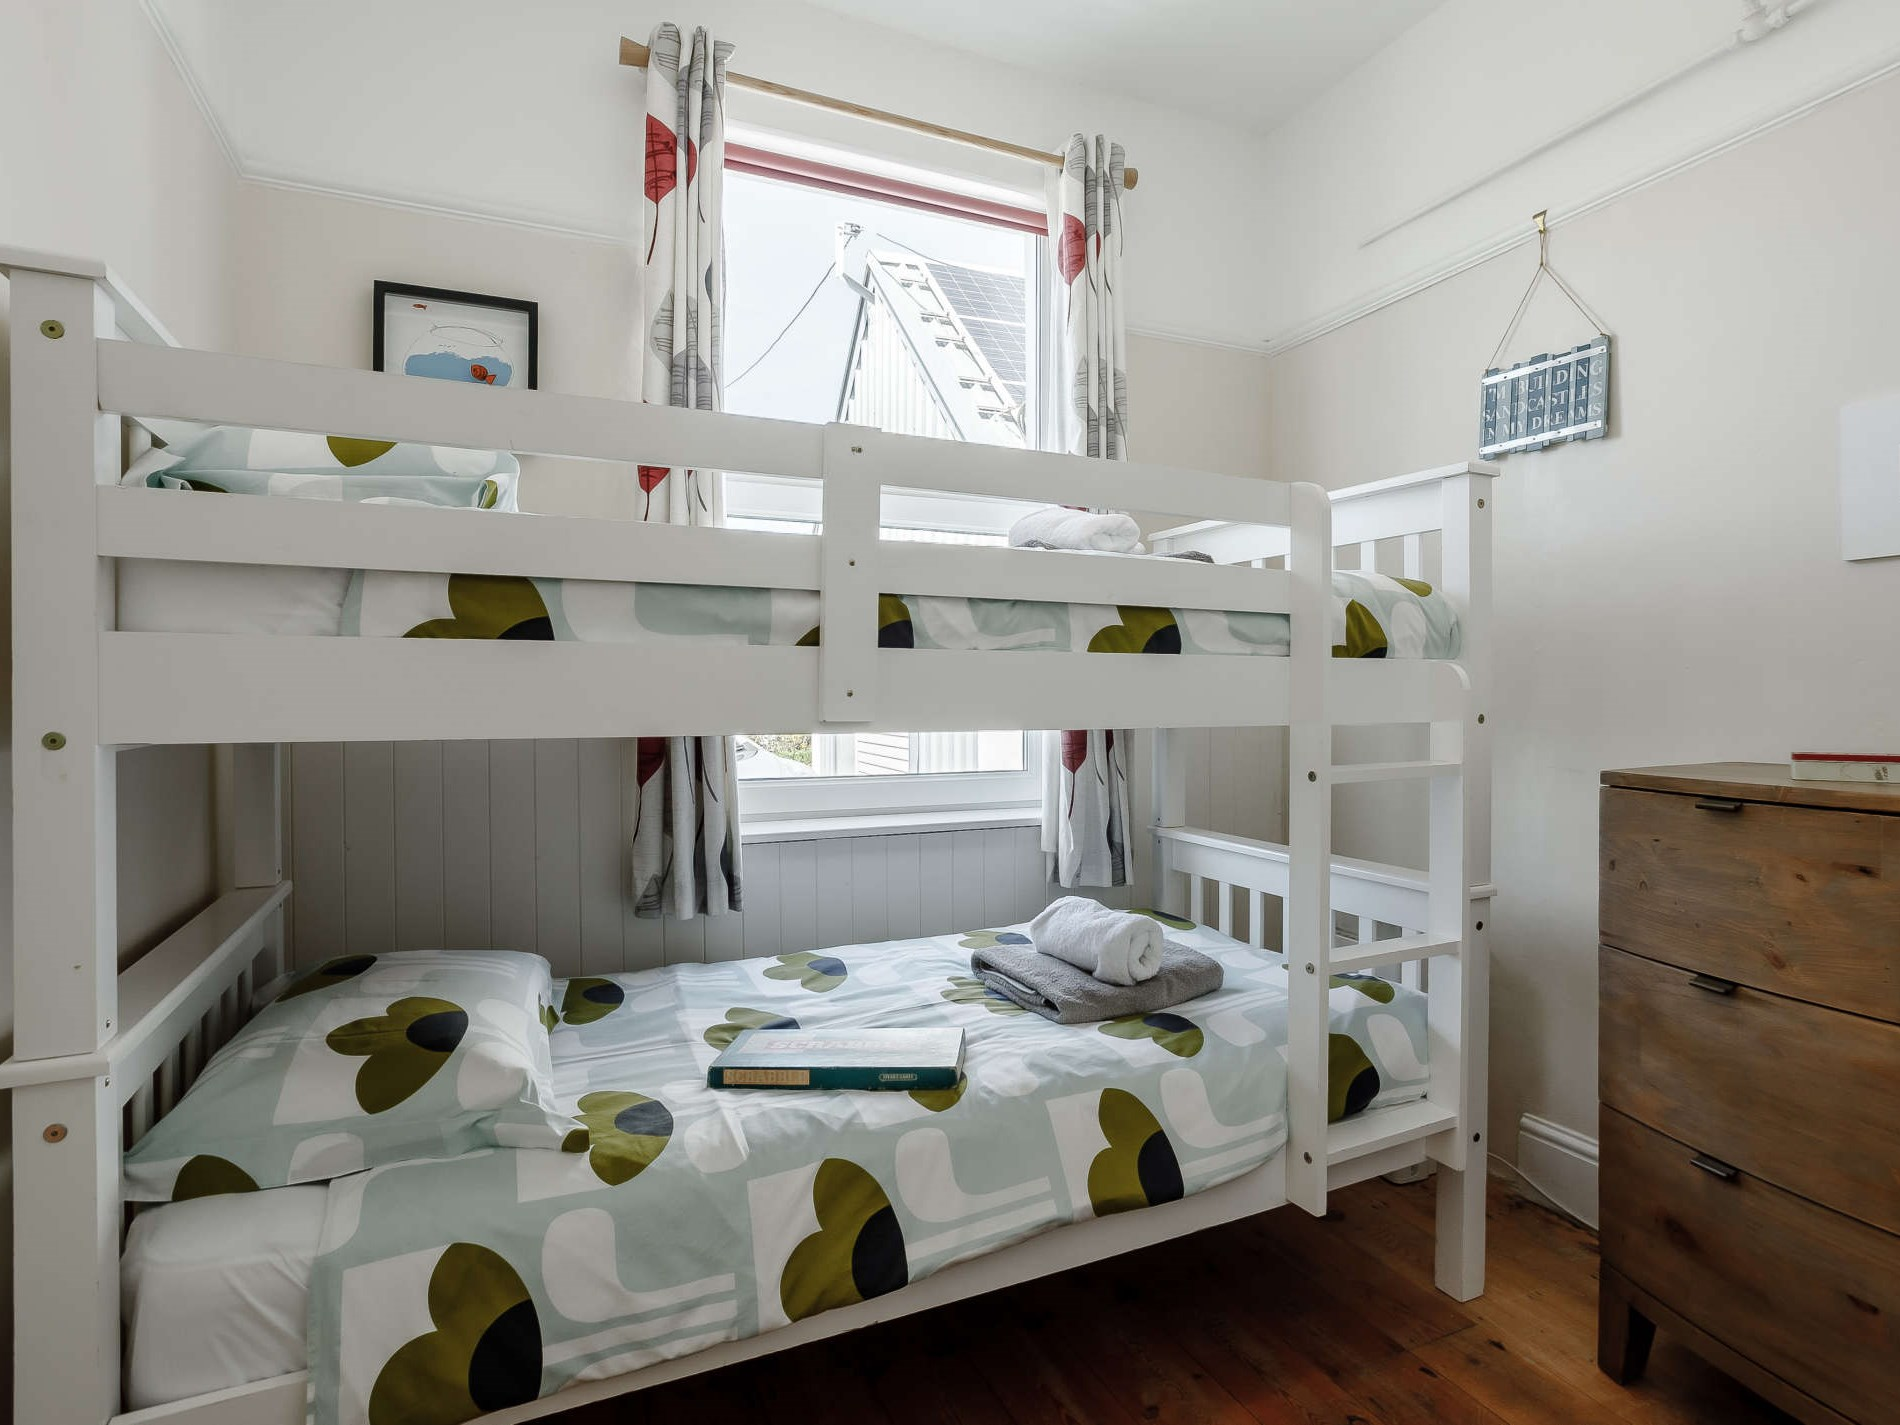 3 Bedroom Cottage in Woolacombe, Devon